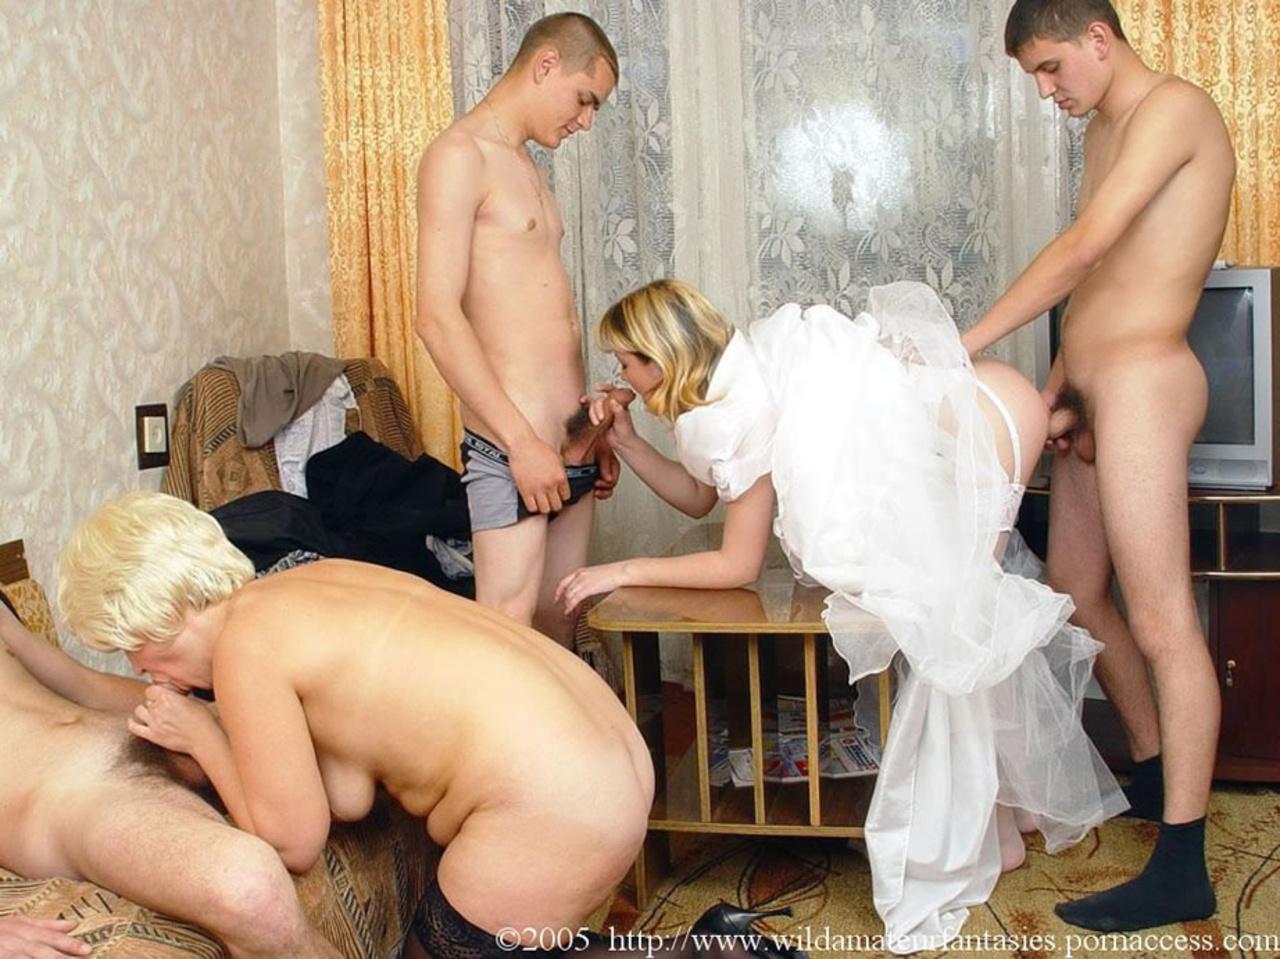 Фото секс отец и невестка 3 фотография